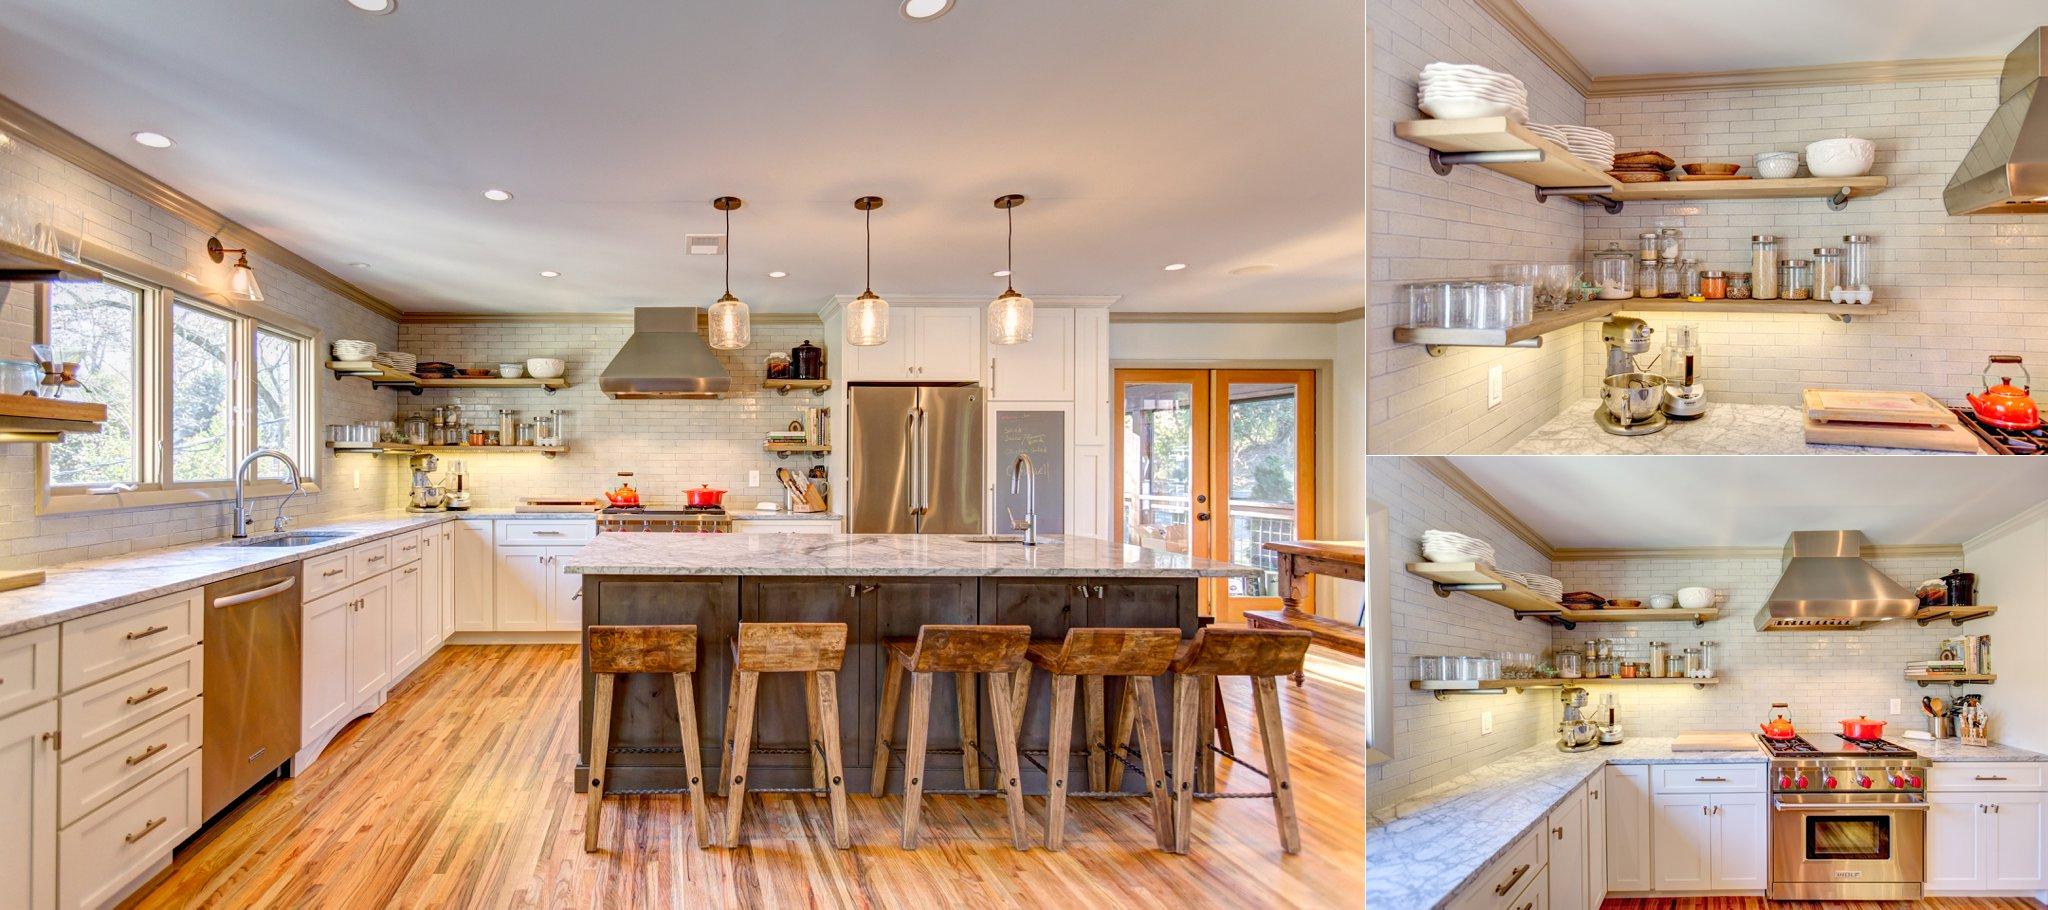 counter dimensions - birmingham, al real estate - kitchen remodeling